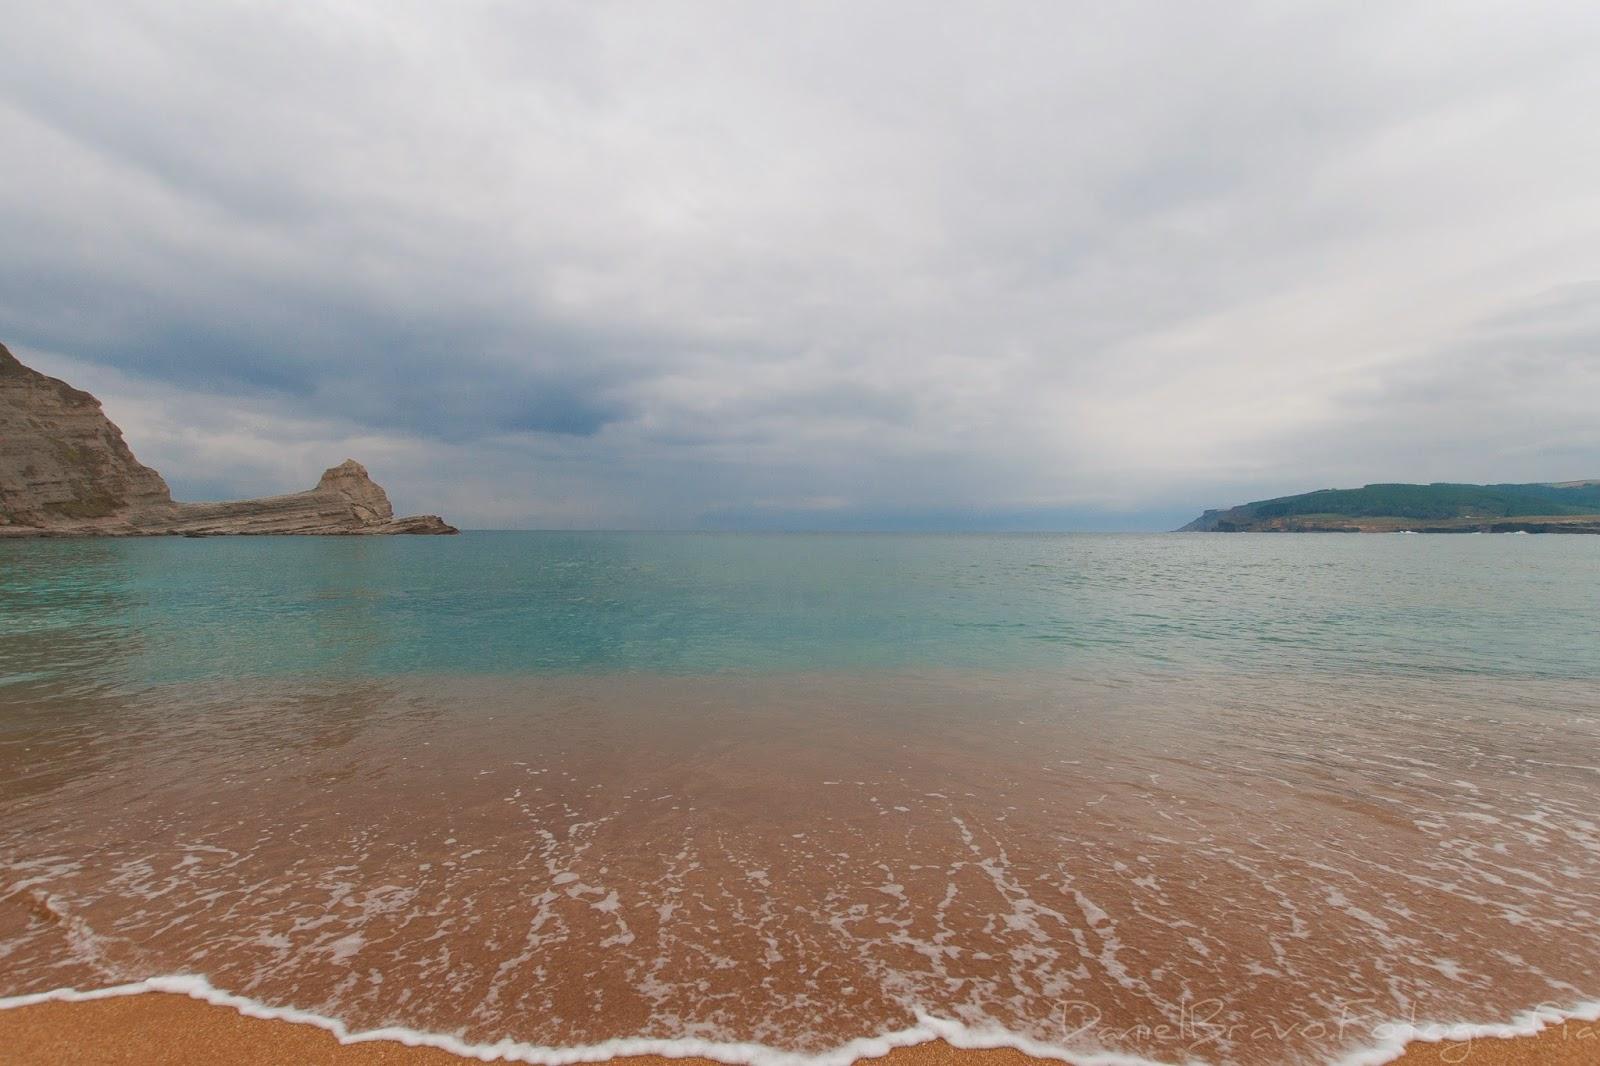 playa, arena, playa, mar, olas, Loredo, Langre, Somo, Cantabria, Santander